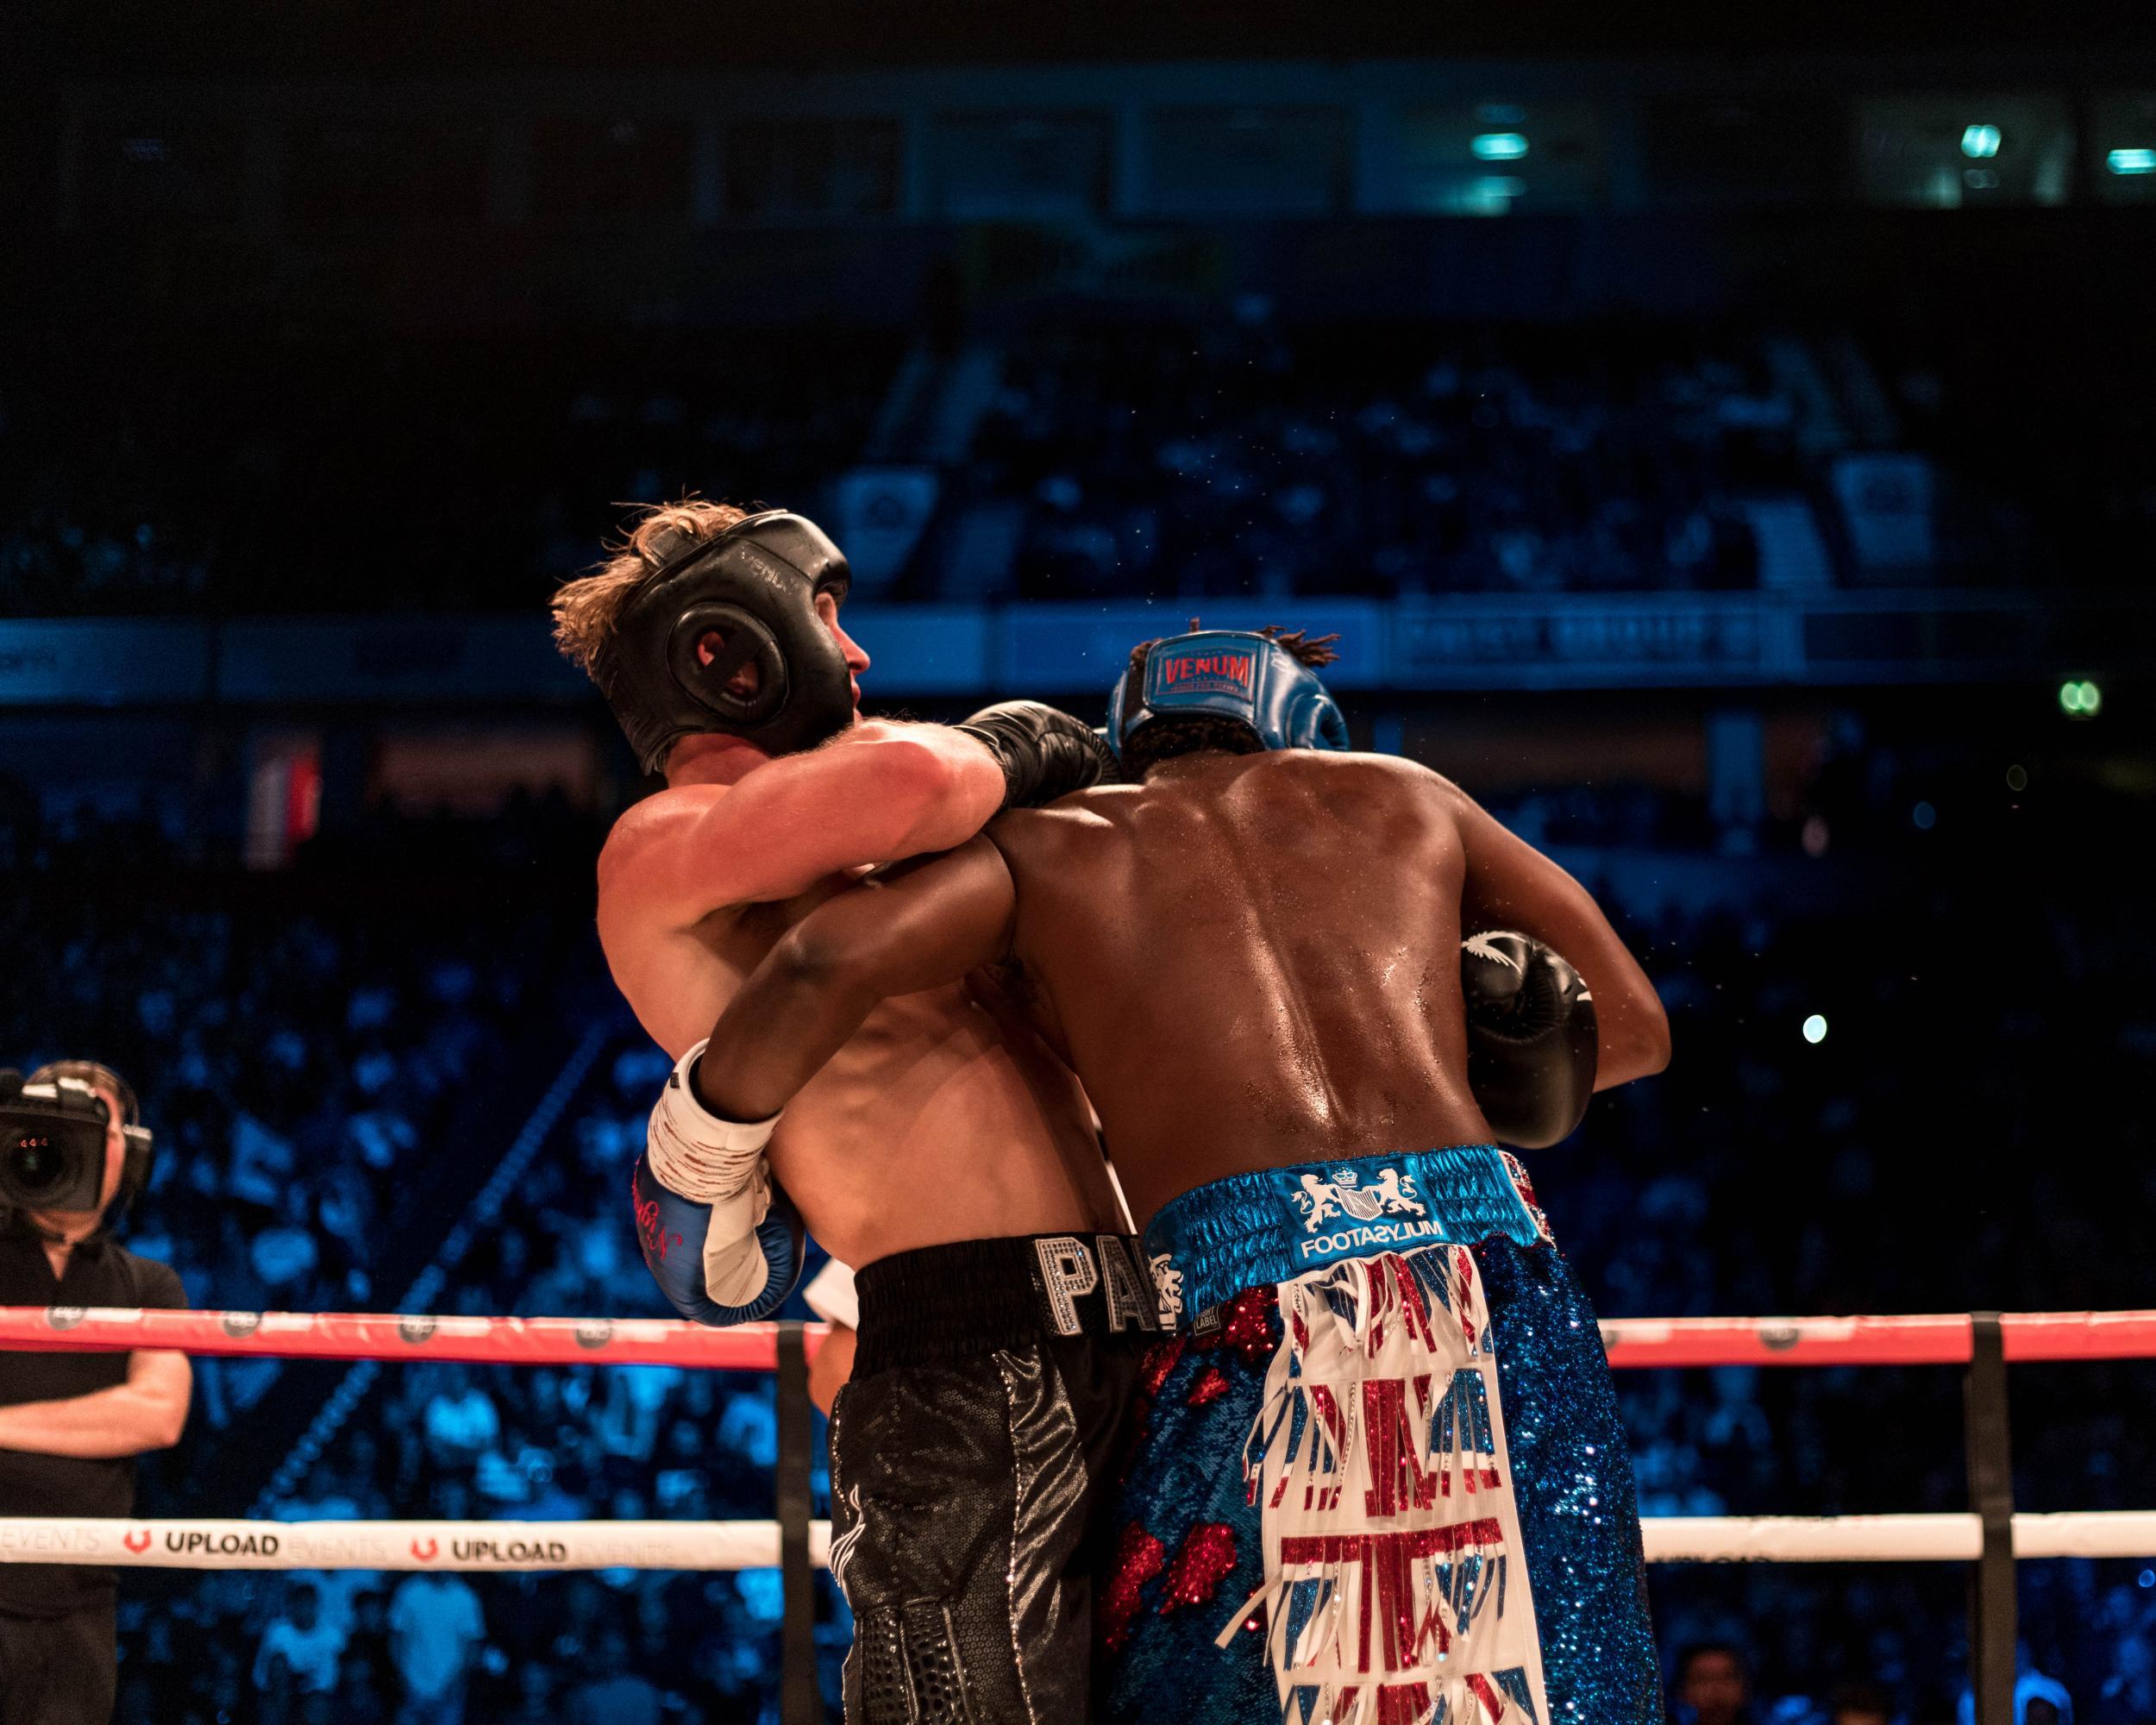 KSI vs Logan Paul rematch: YouTube stars 'agree' to